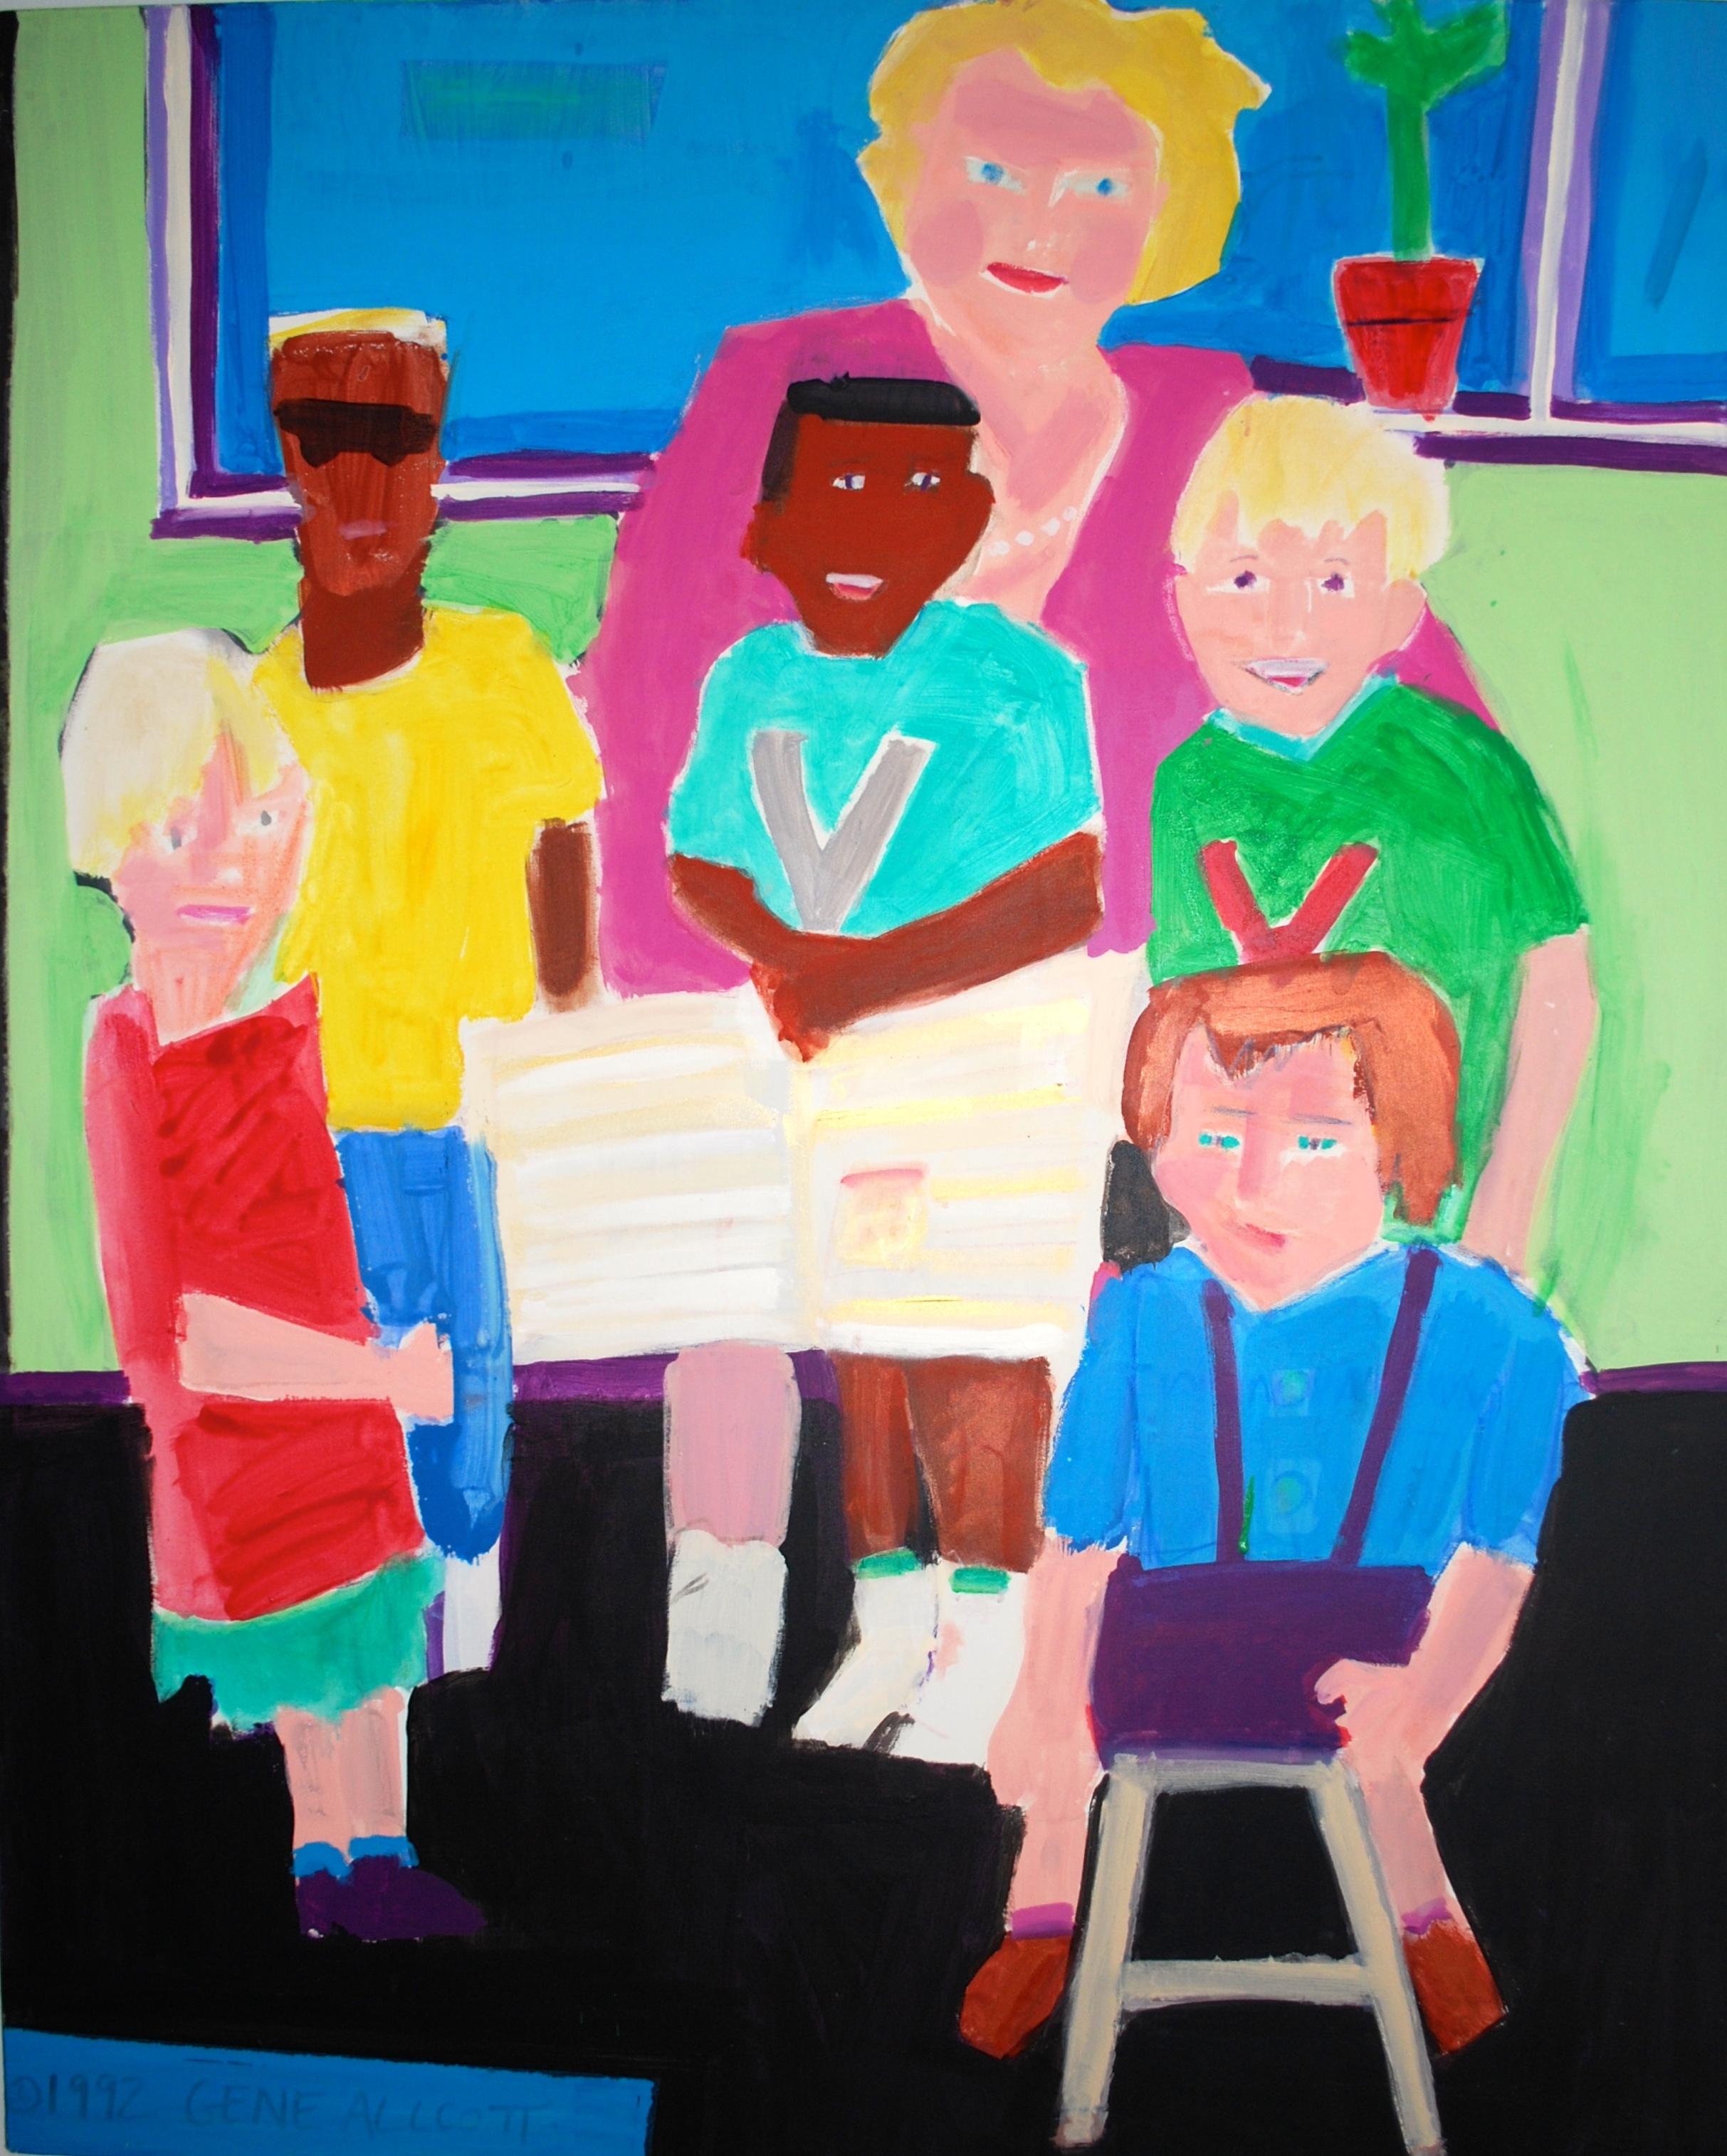 Weekly Reader , Anne Stallard, former President the YWCA of America, reads to children